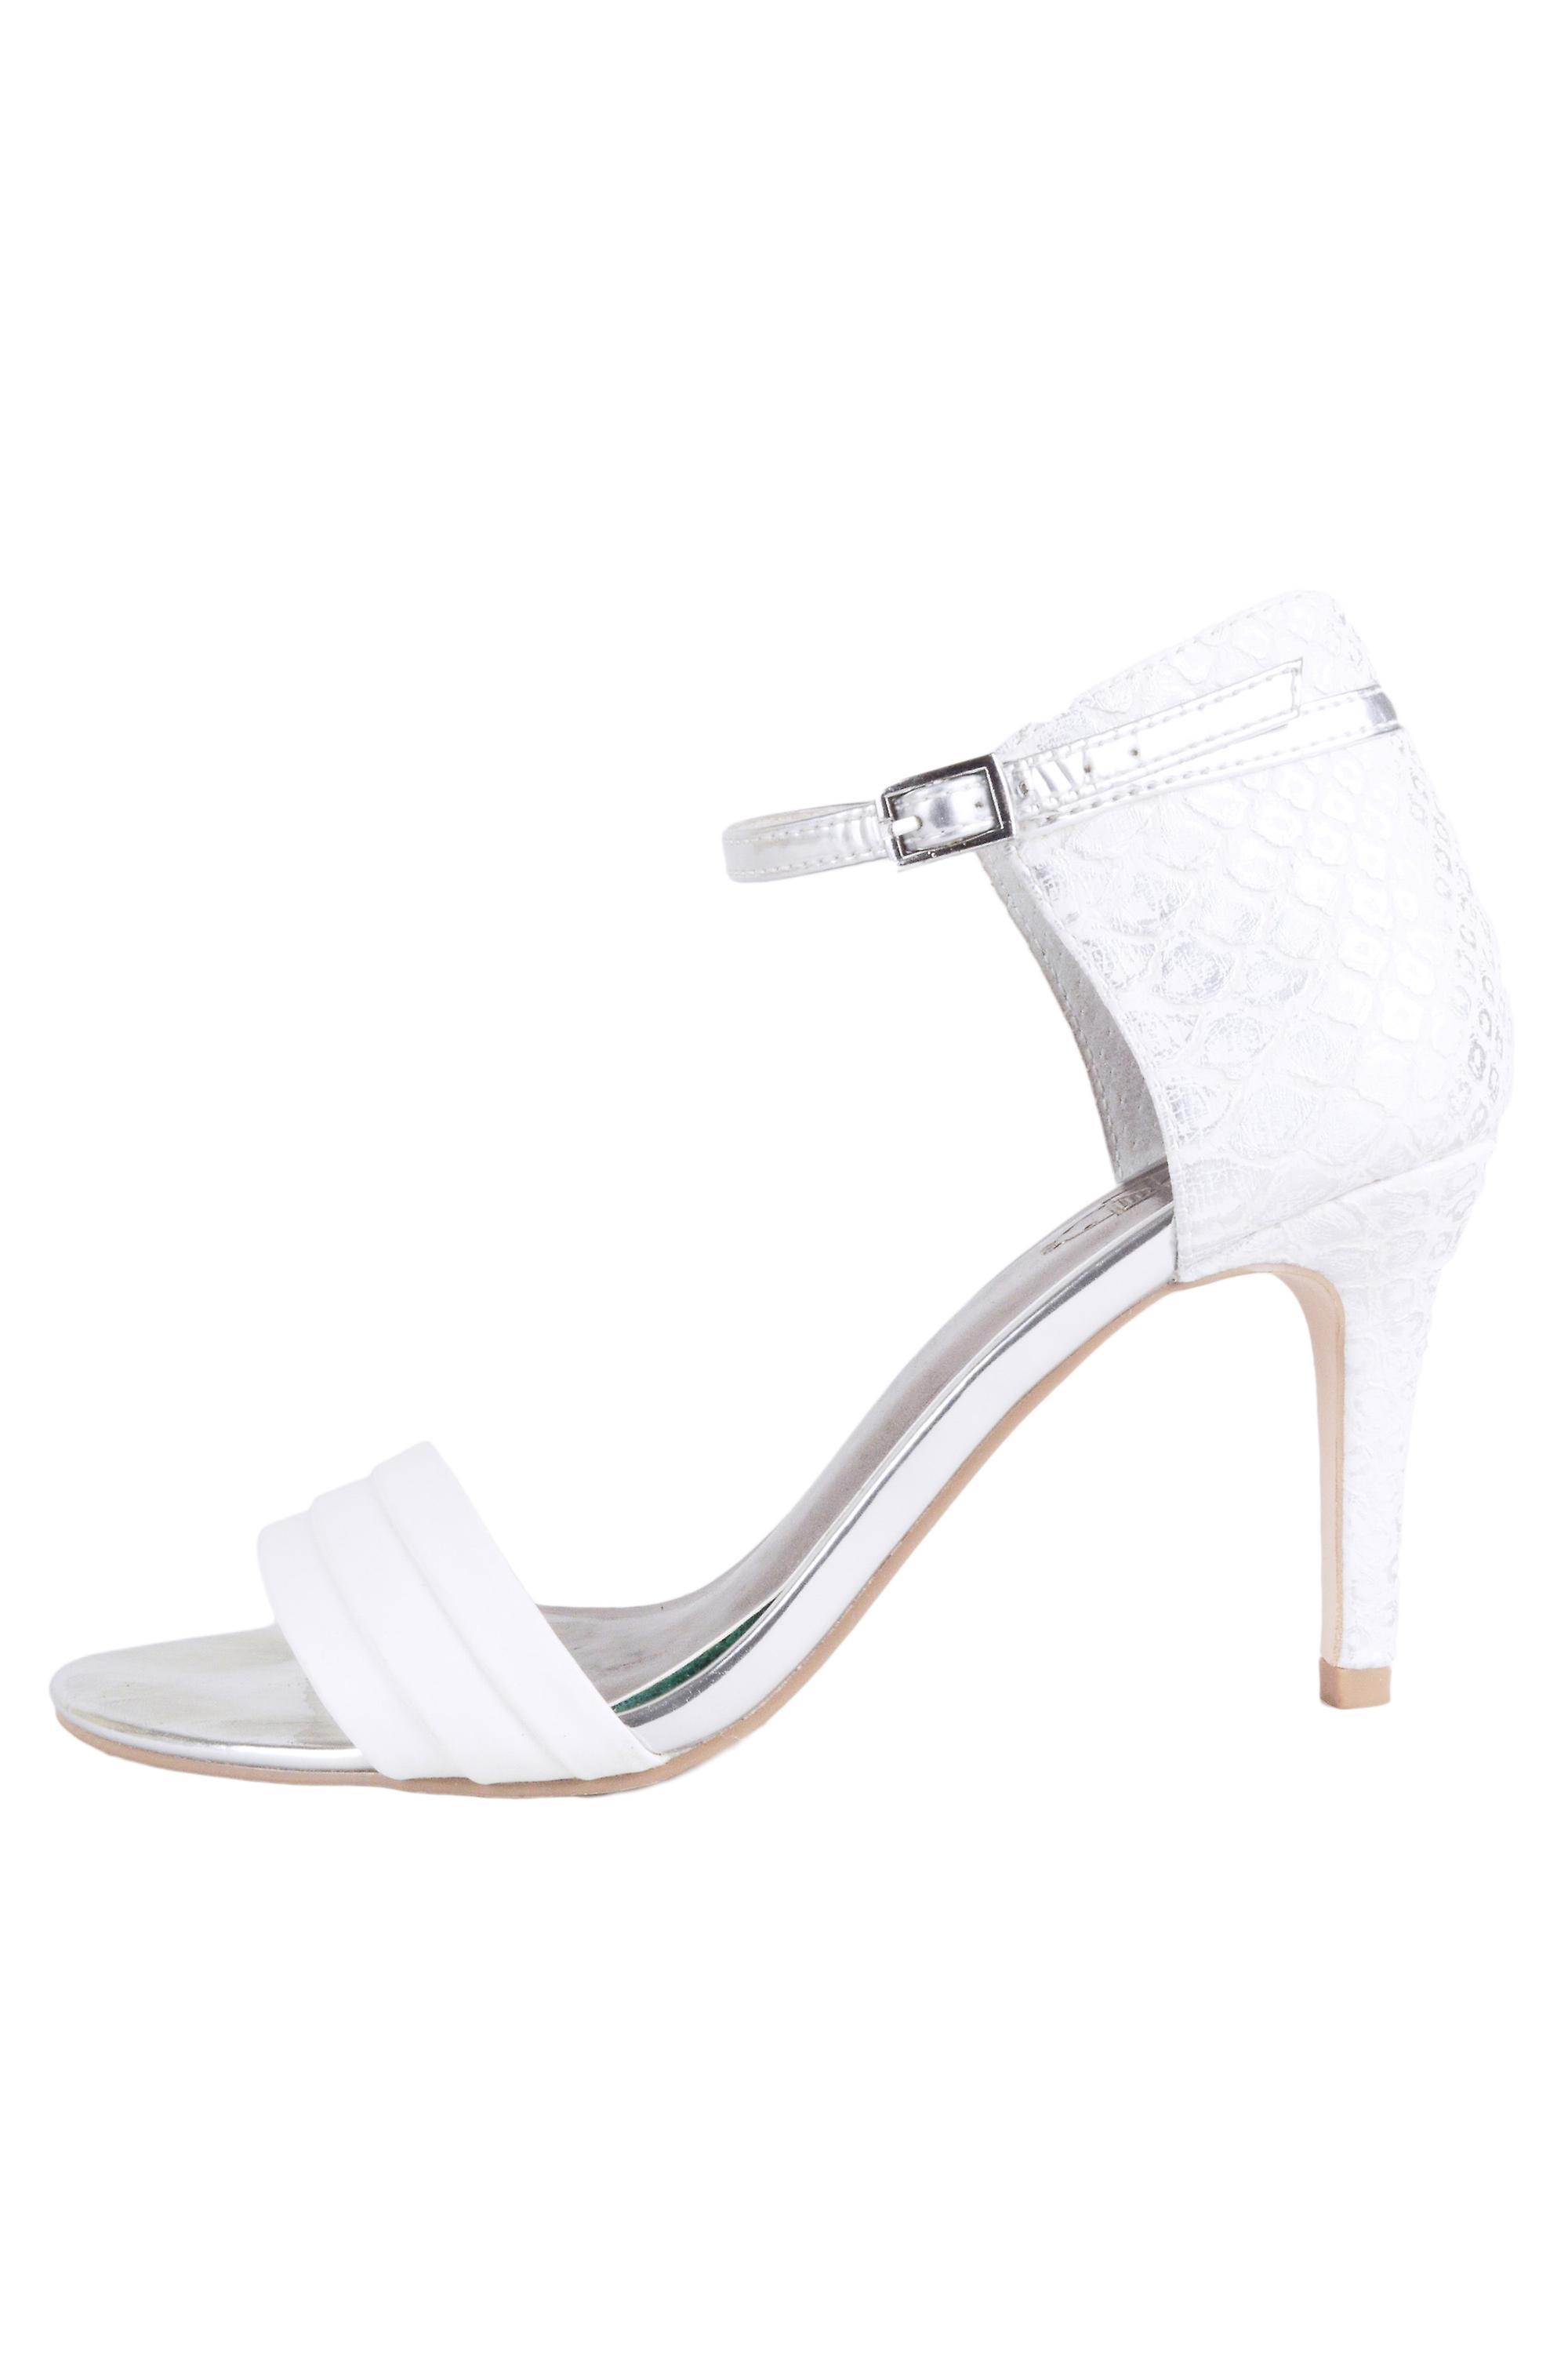 Lovemystyle Sandal Heels With Metallic Snakeskin Heel